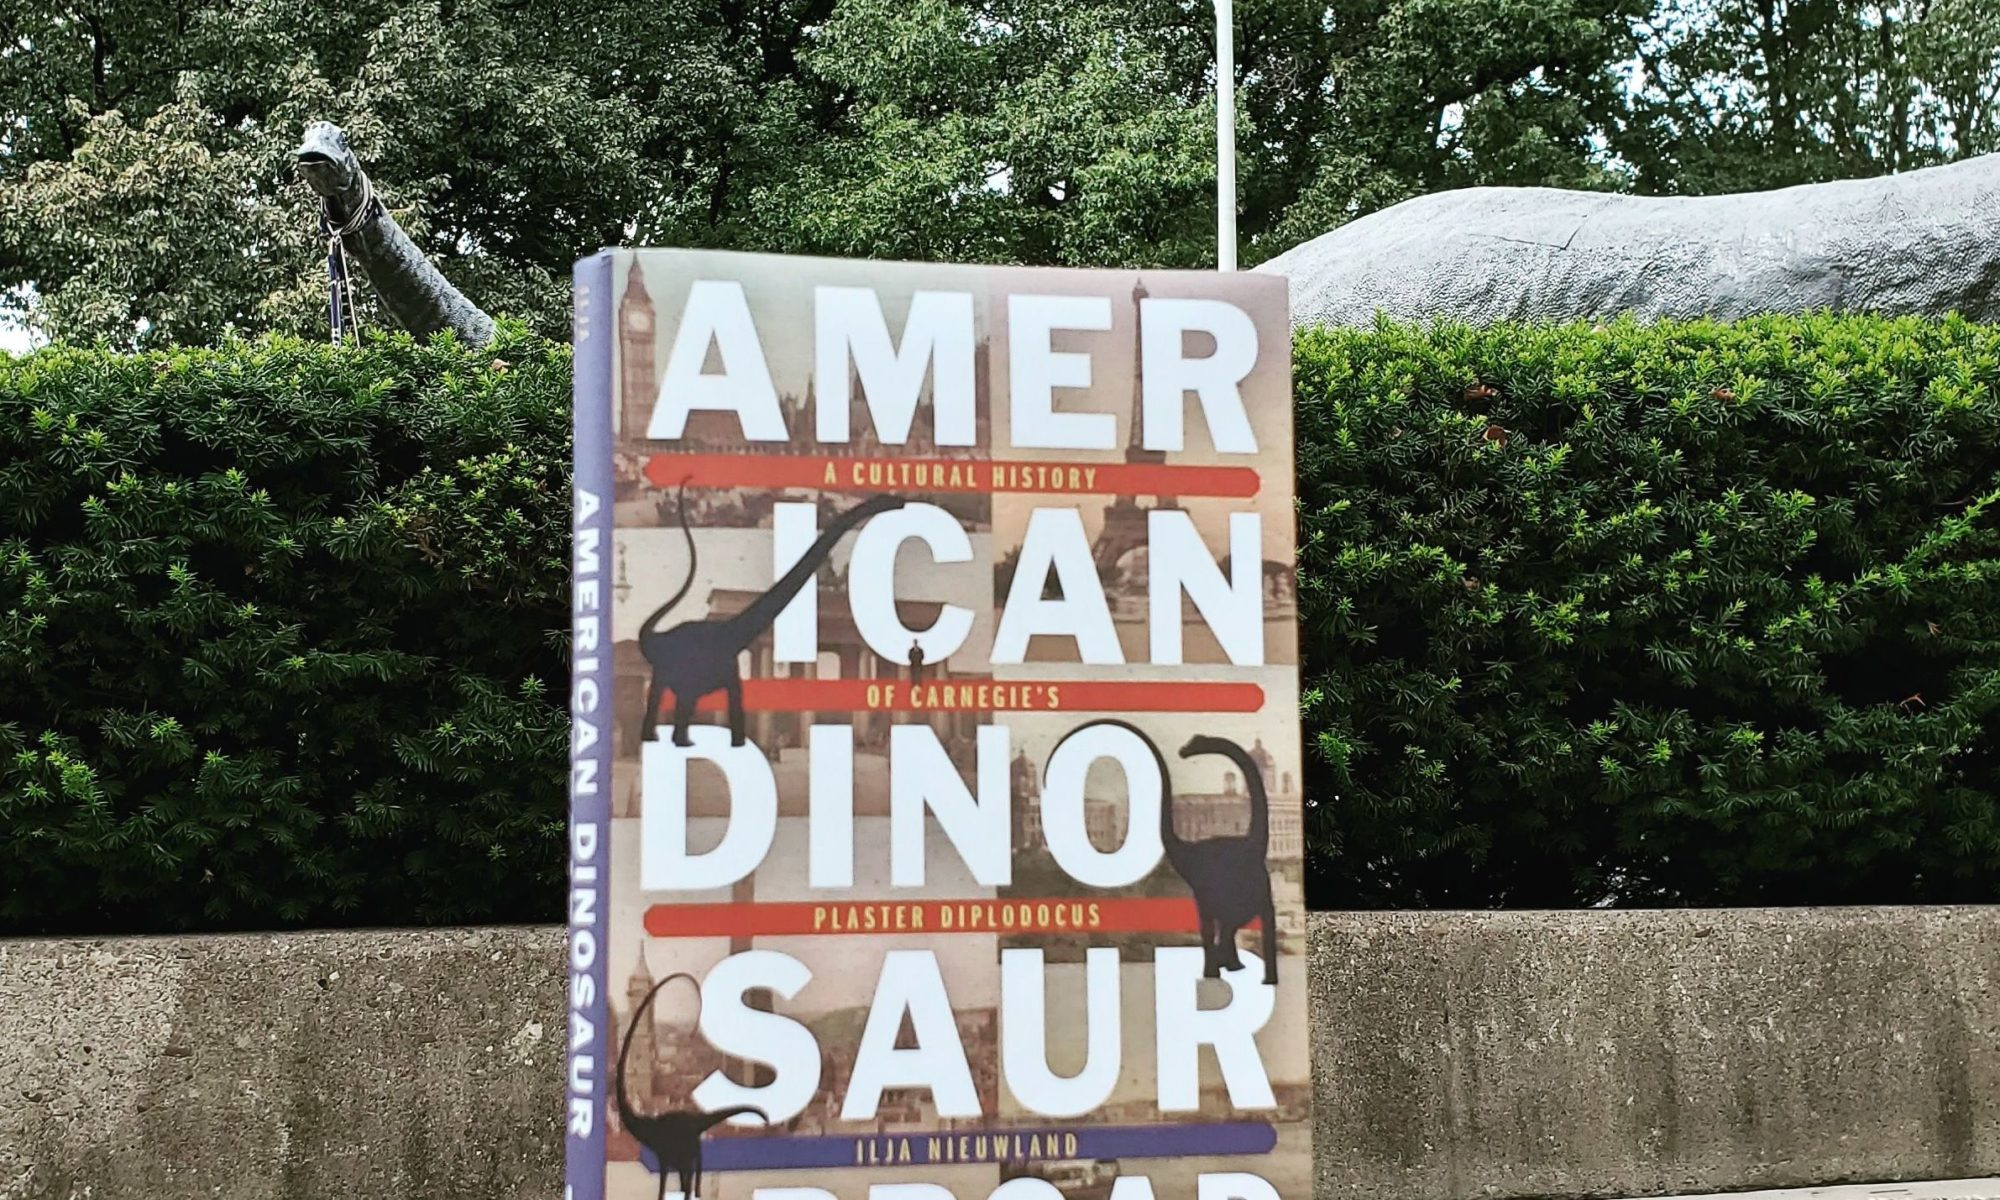 Ilja Nieuwland American Dinosaur Abroad